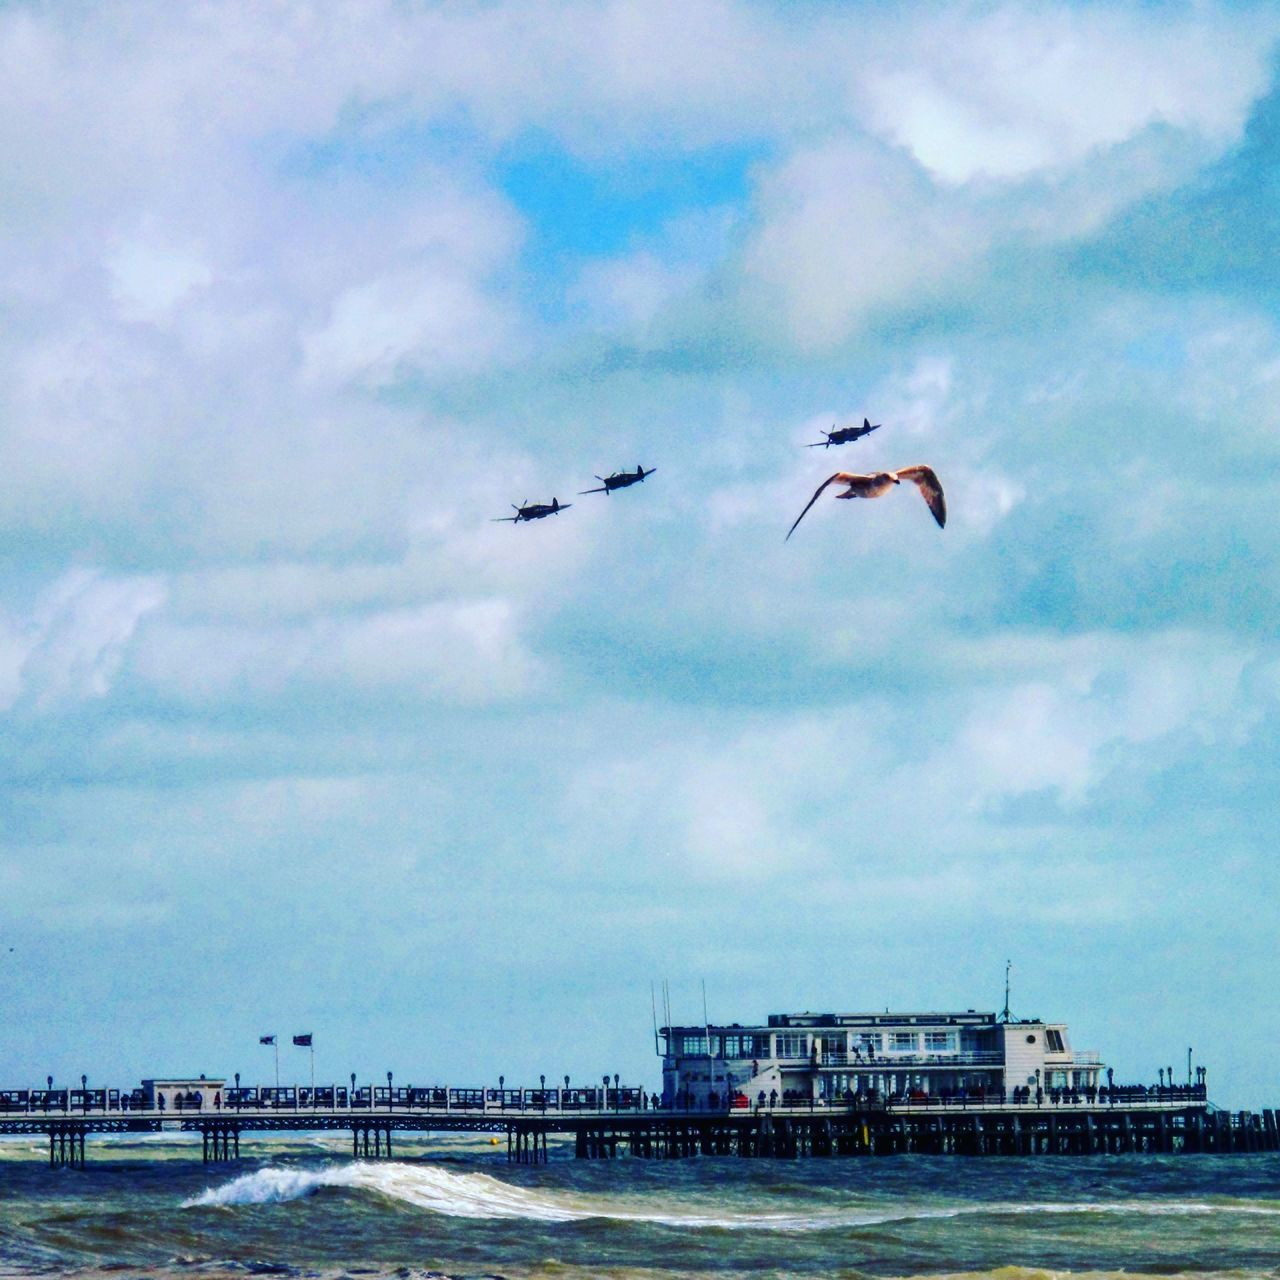 Worthing Worthing Pier Sea Worthingpier Spitfire Plane